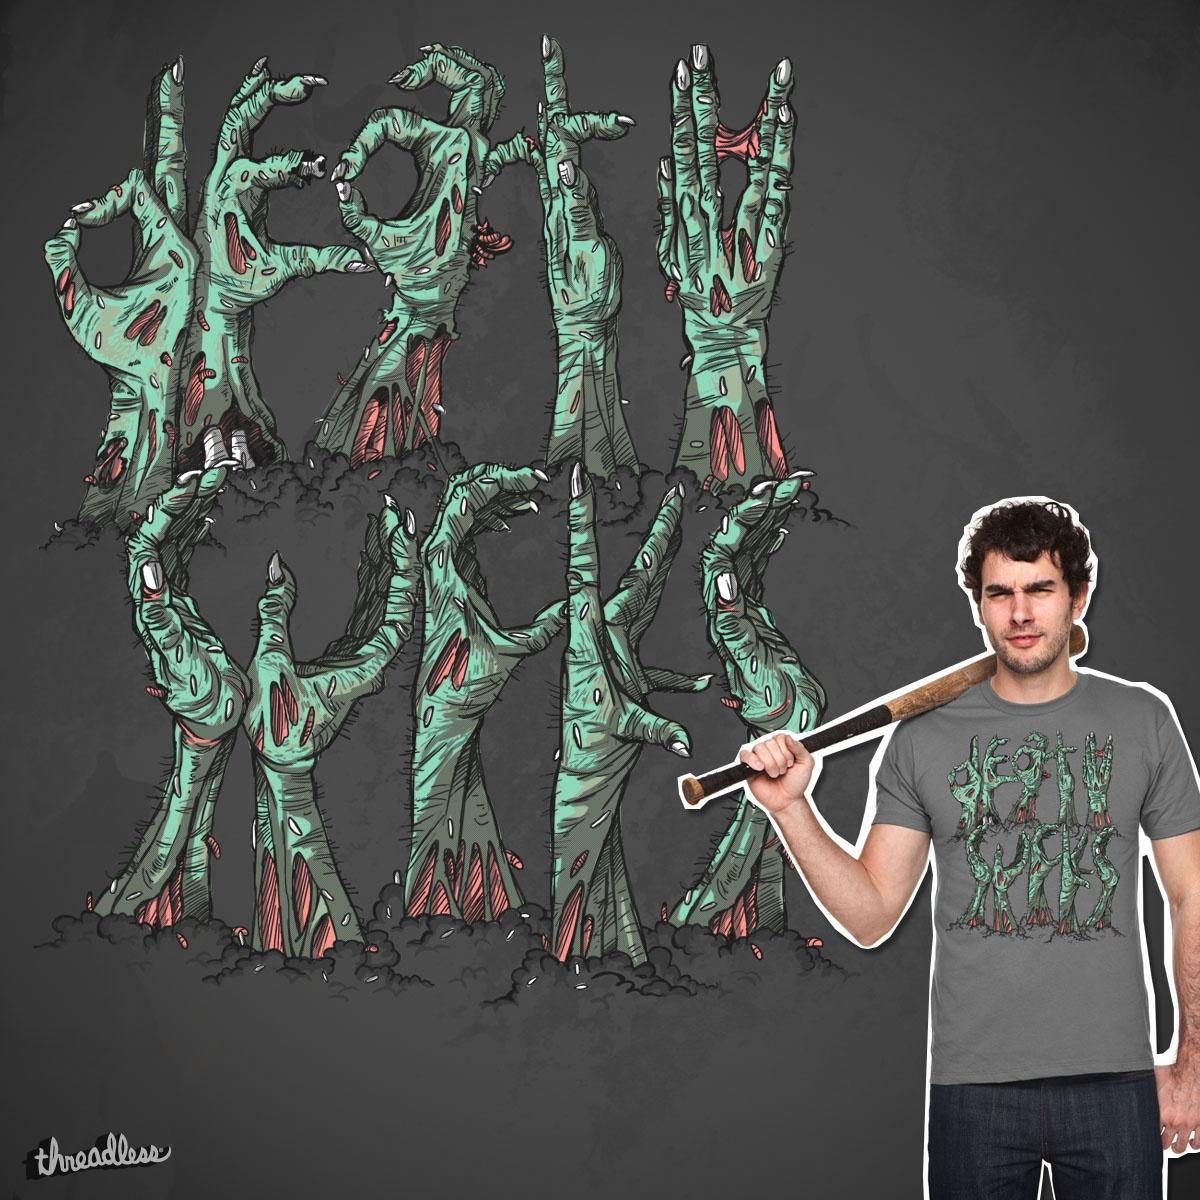 Death Sucks by Marcos Moraes and Sandalo on Threadless